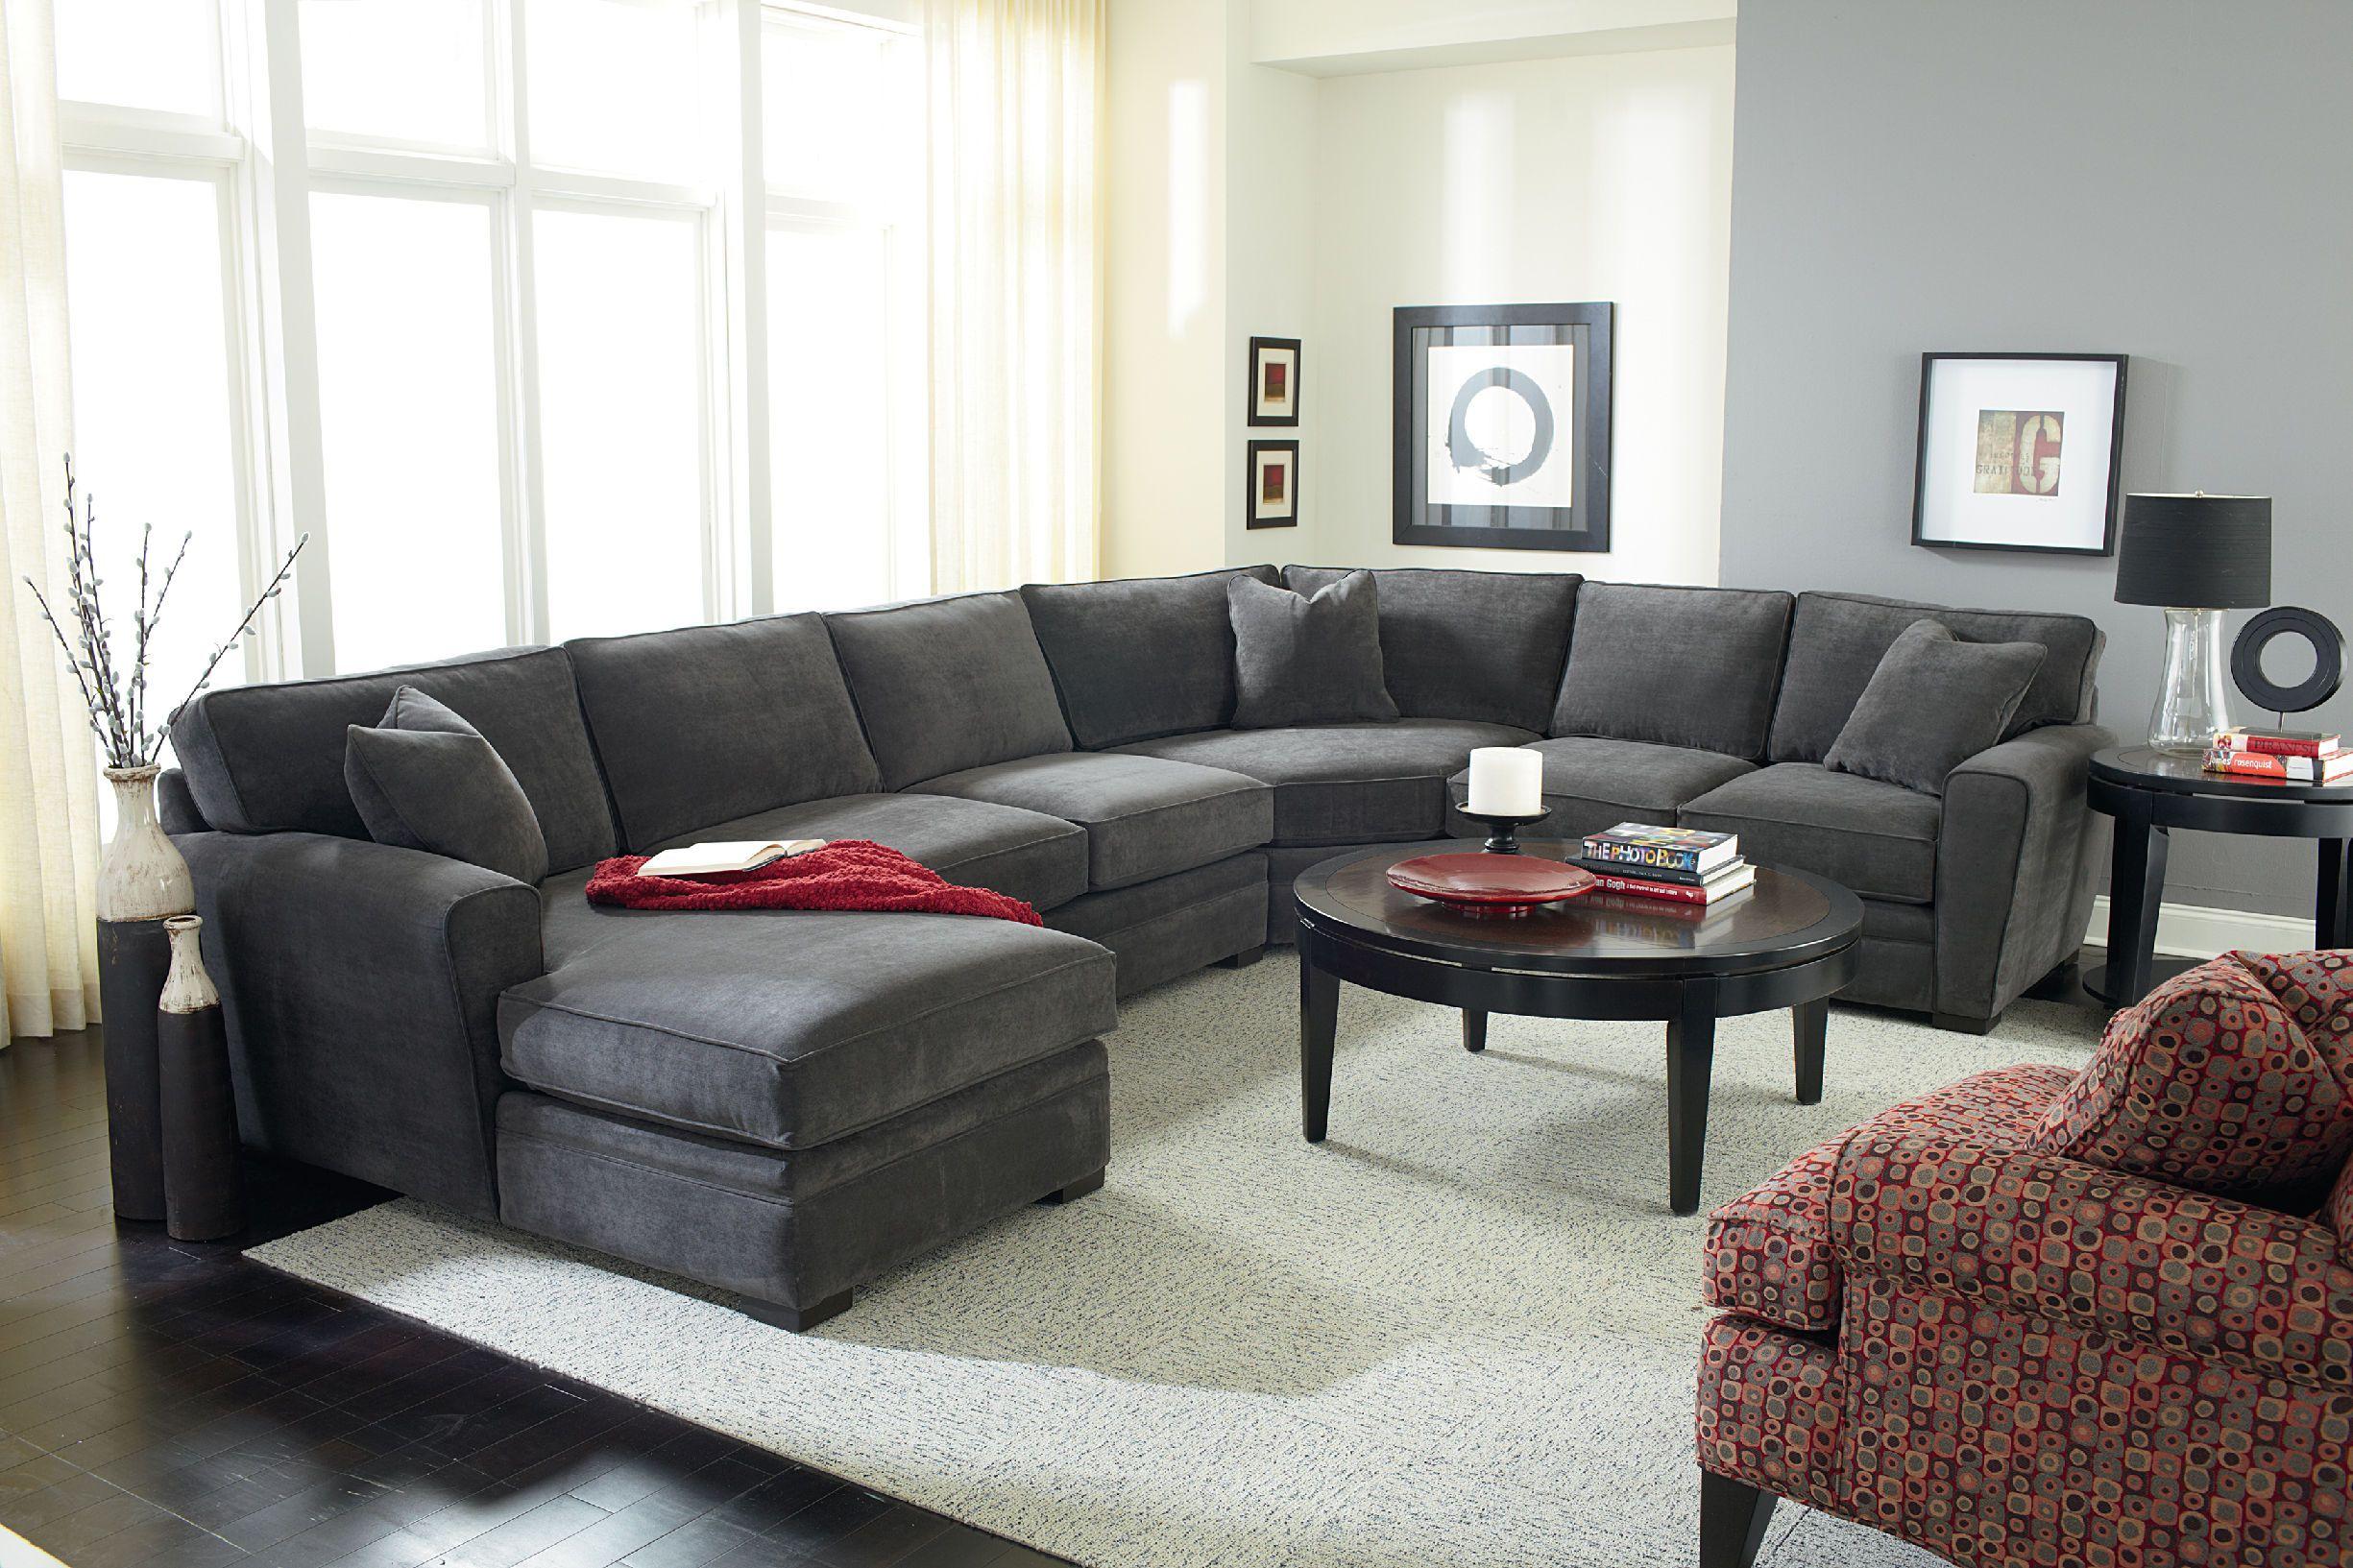 Fine Pin On 1110 Furniture Wishlist Inzonedesignstudio Interior Chair Design Inzonedesignstudiocom